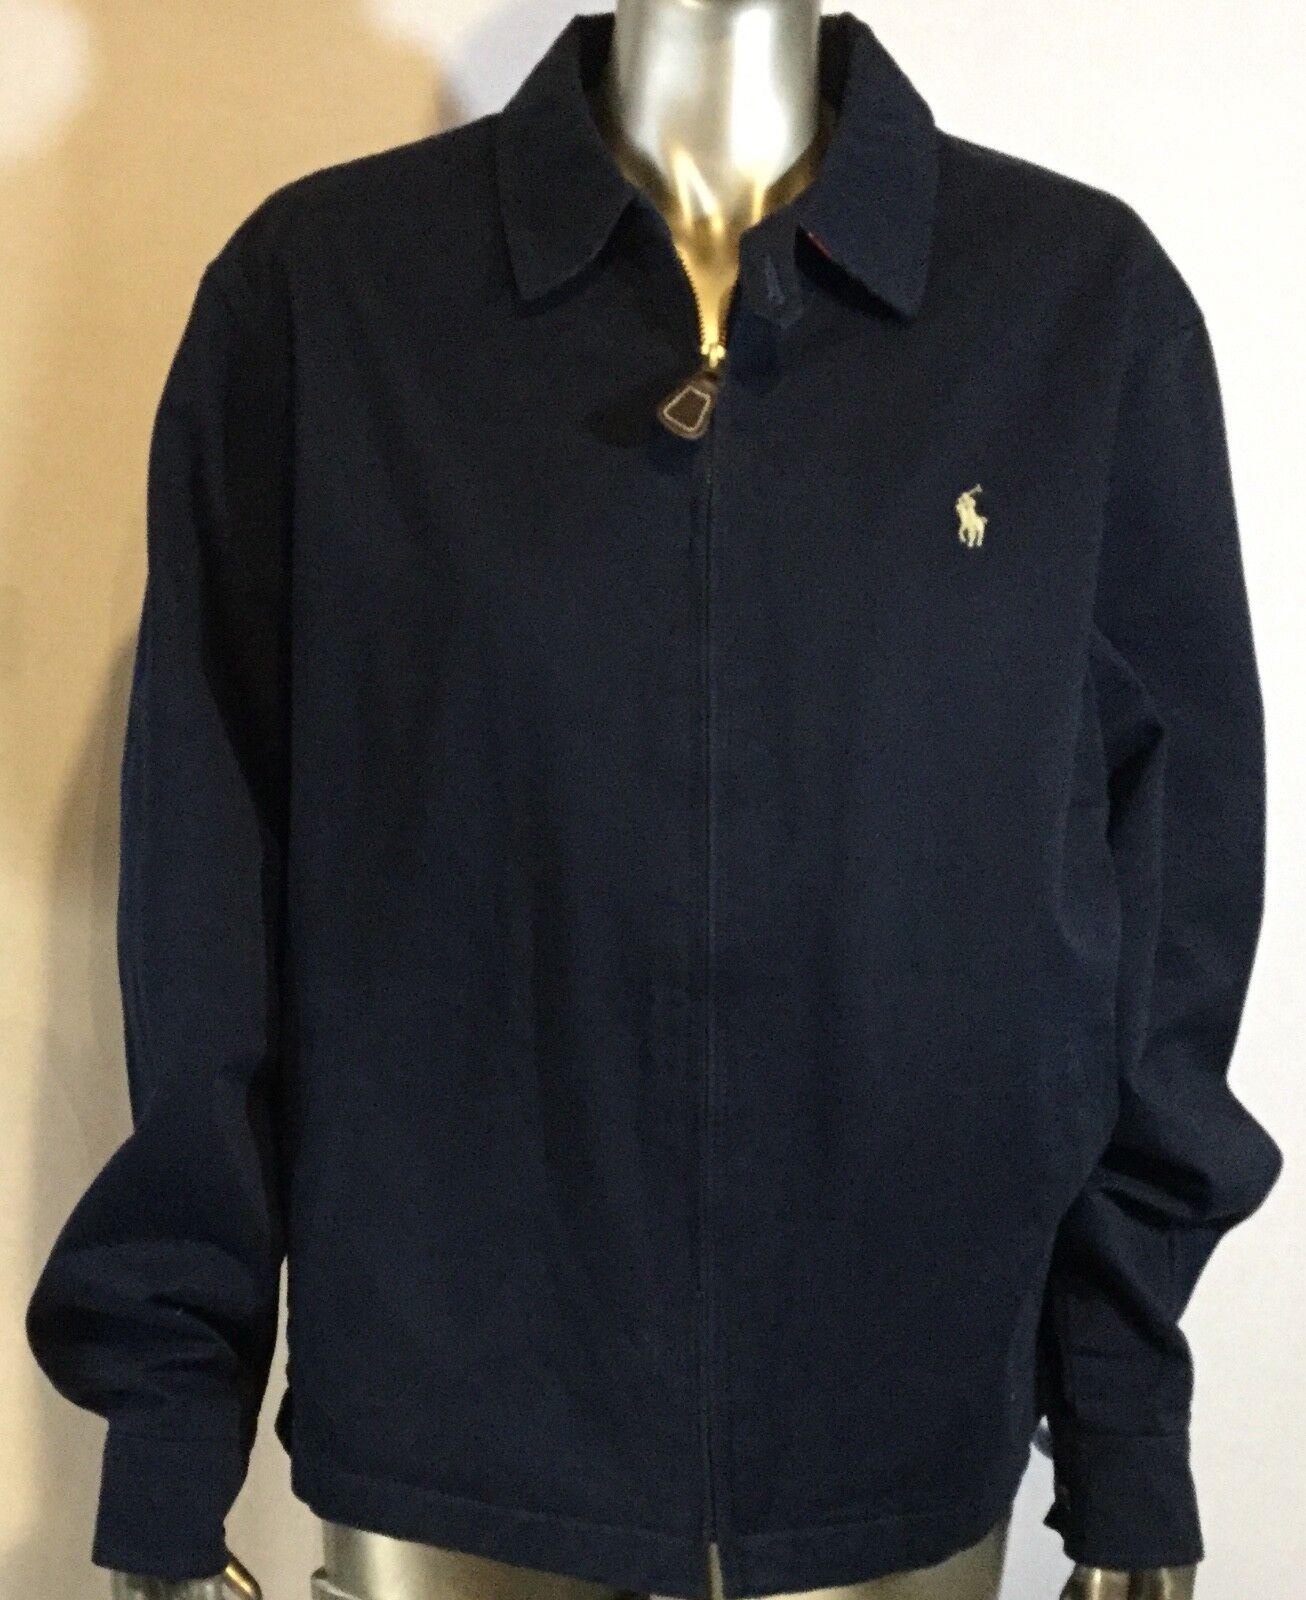 Vintage Polo Ralph Lauren Mens, Large, 100% Cotton Zip Up, navy